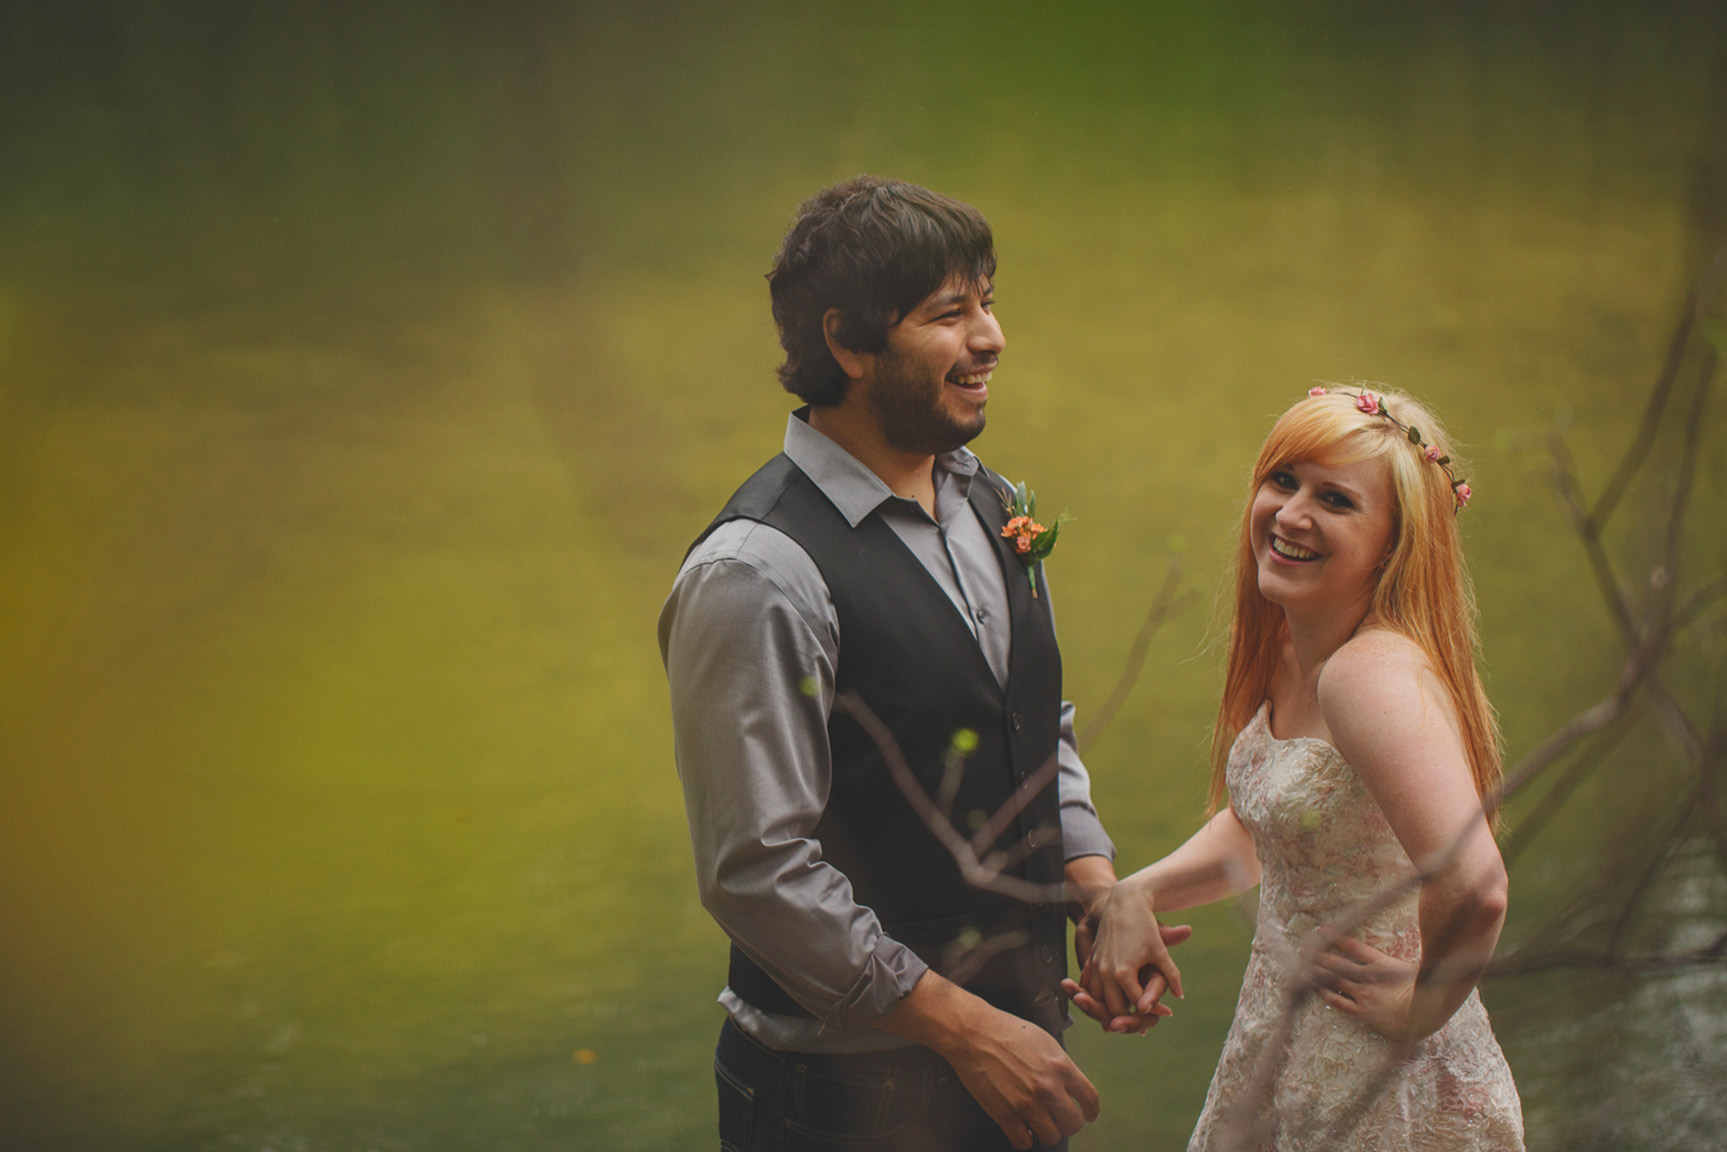 PhotobyBetsy-elopement013.jpg